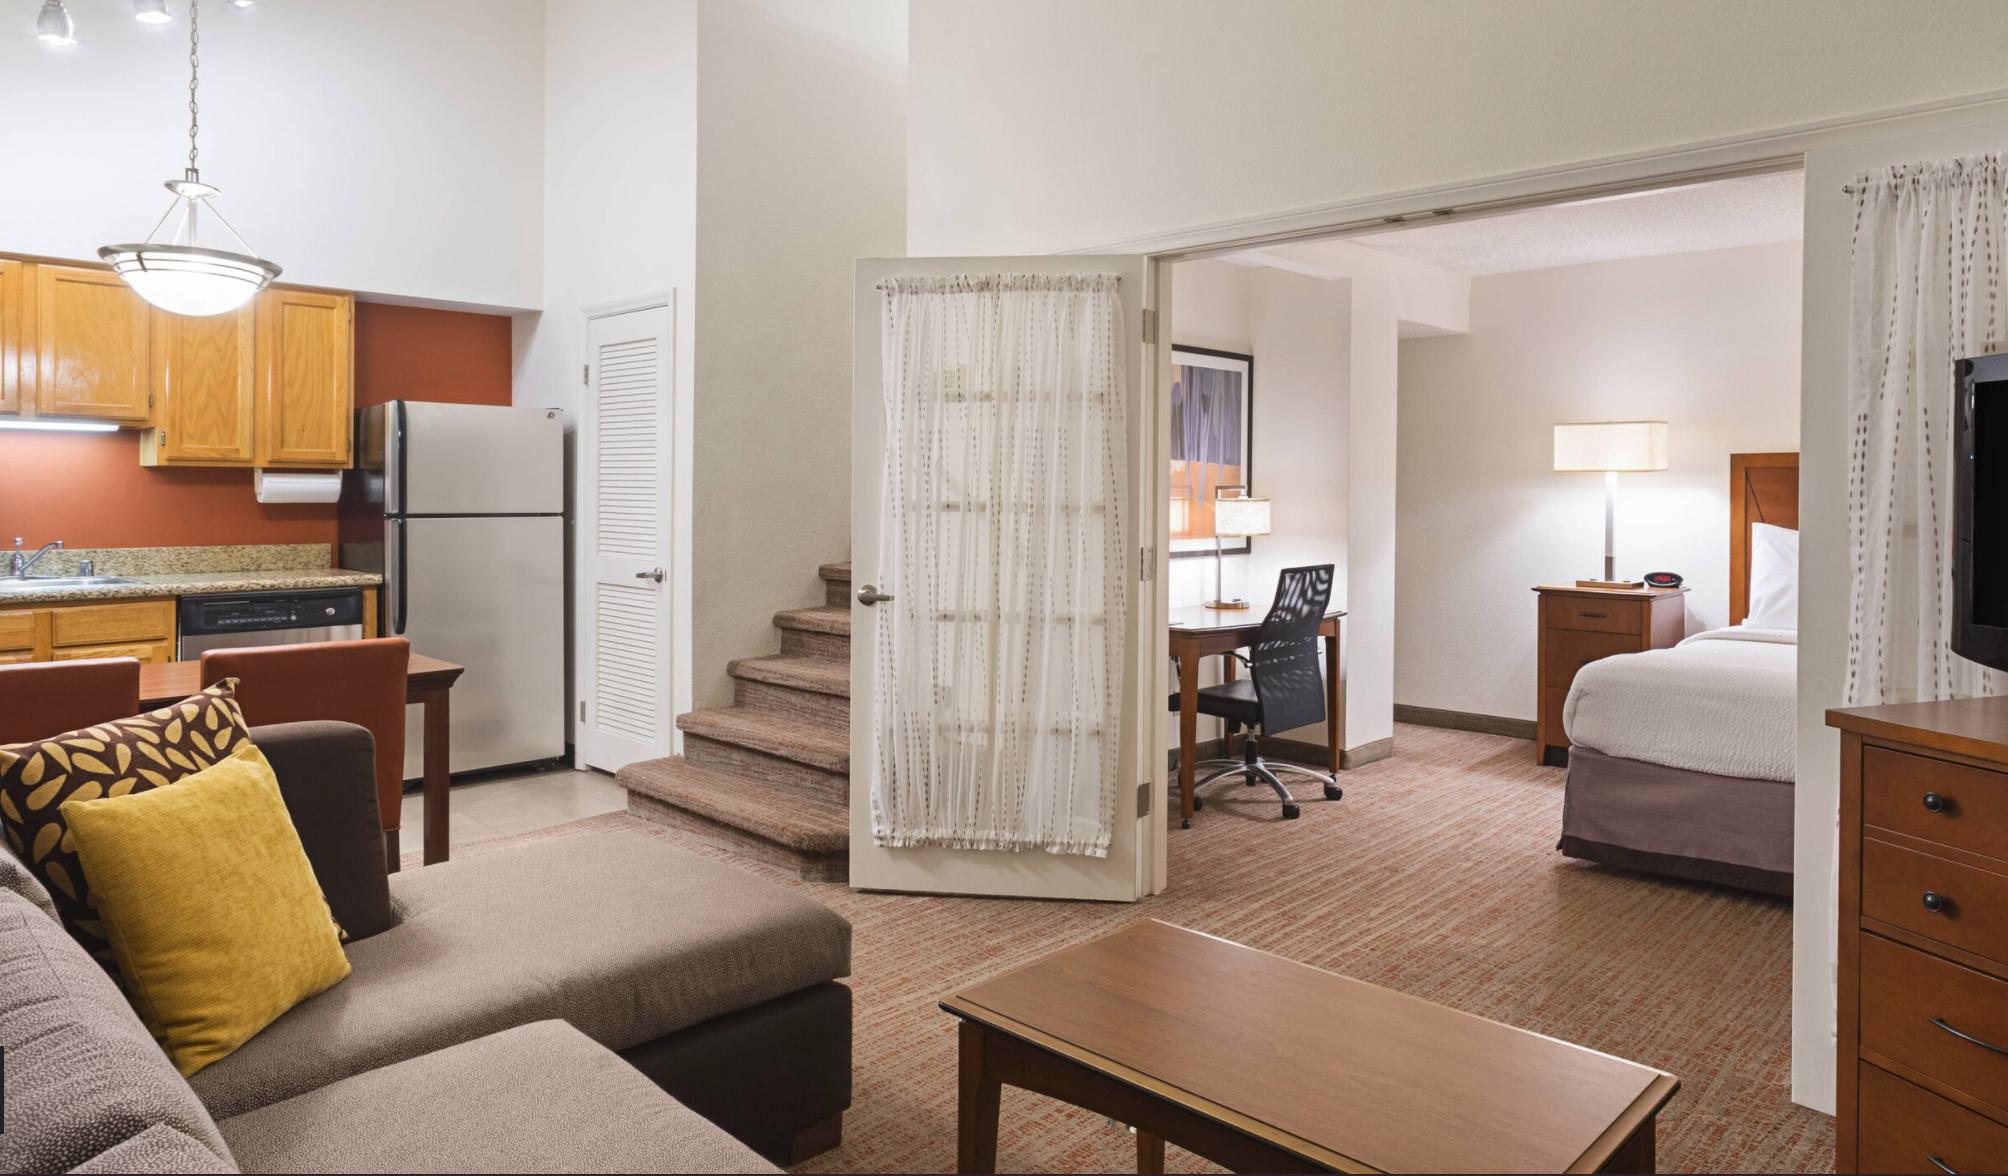 https://www.hotelsbyday.com/_data/default-hotel_image/4/21082/screenshot-2020-08-19-at-6-48-54-pm.png